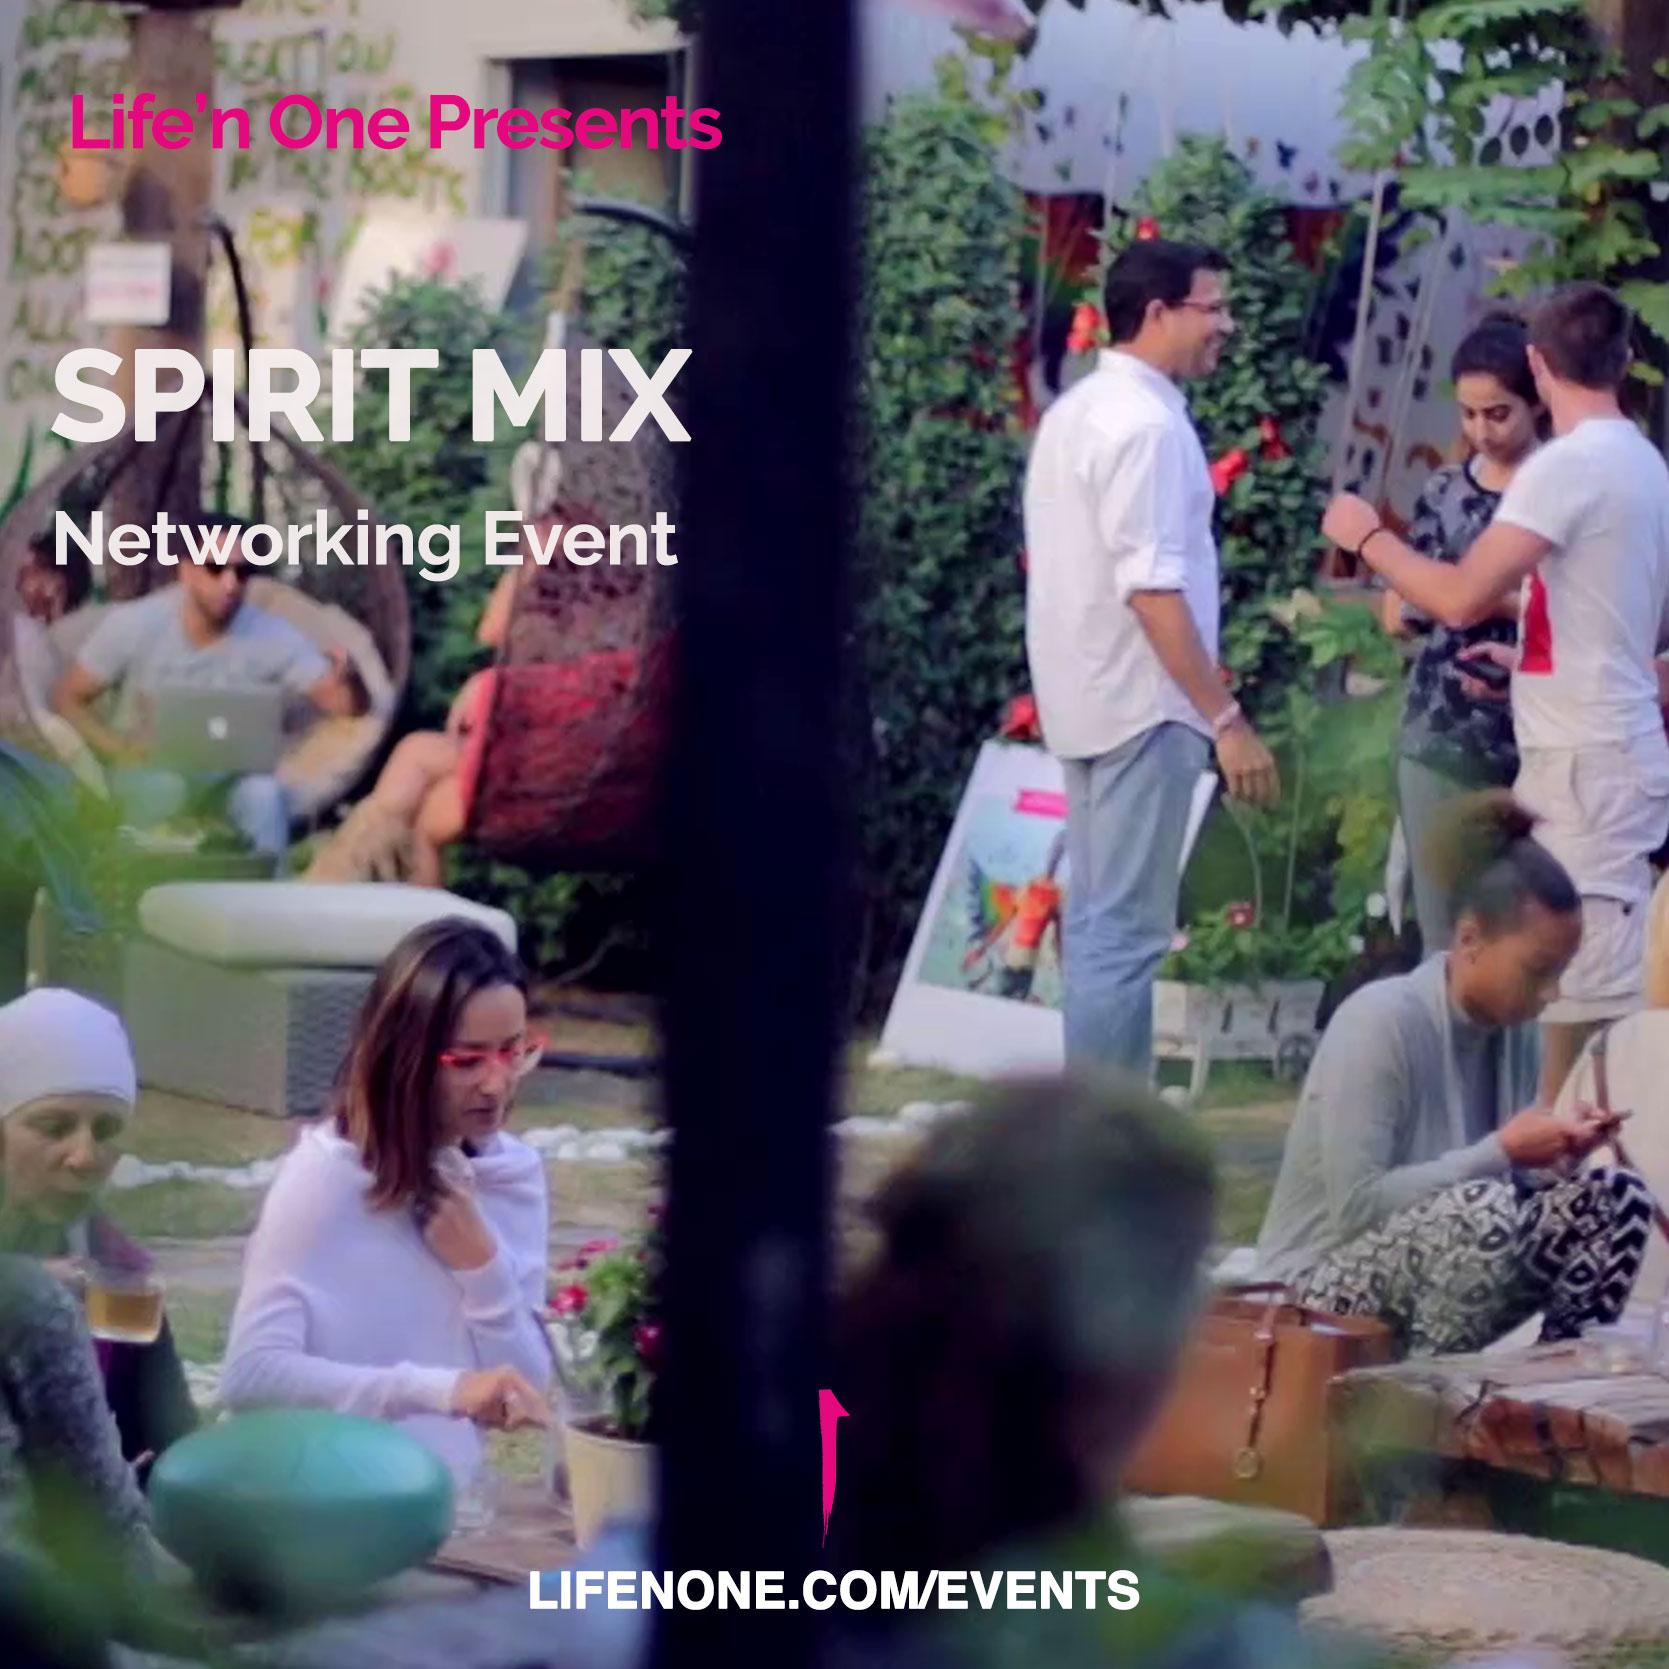 190909-spirit-mix-networking-event.jpg